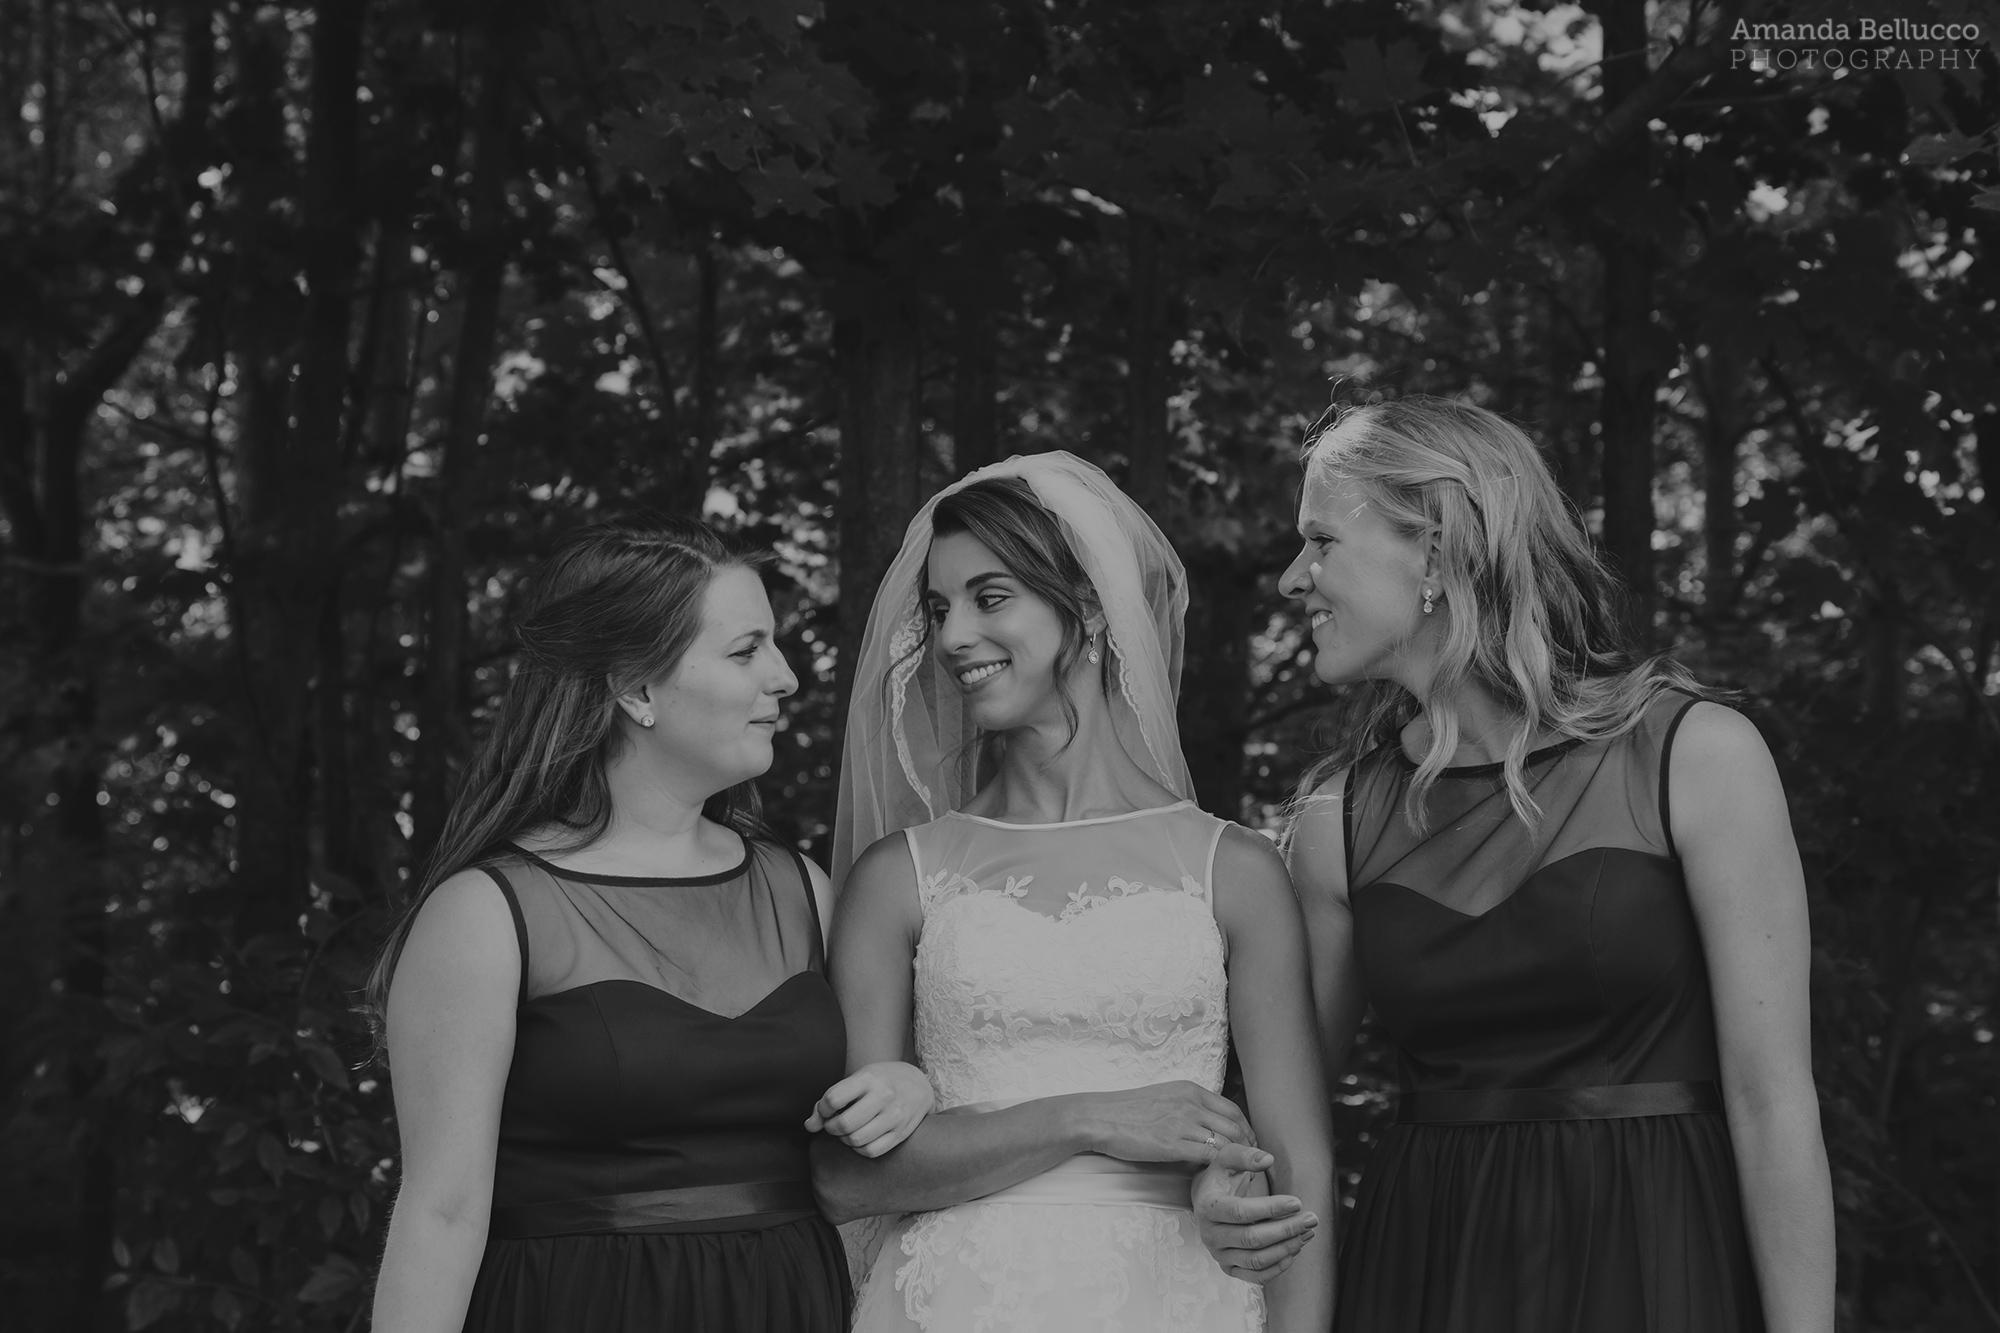 buffalo_ny_wedding_photographer_46.jpg